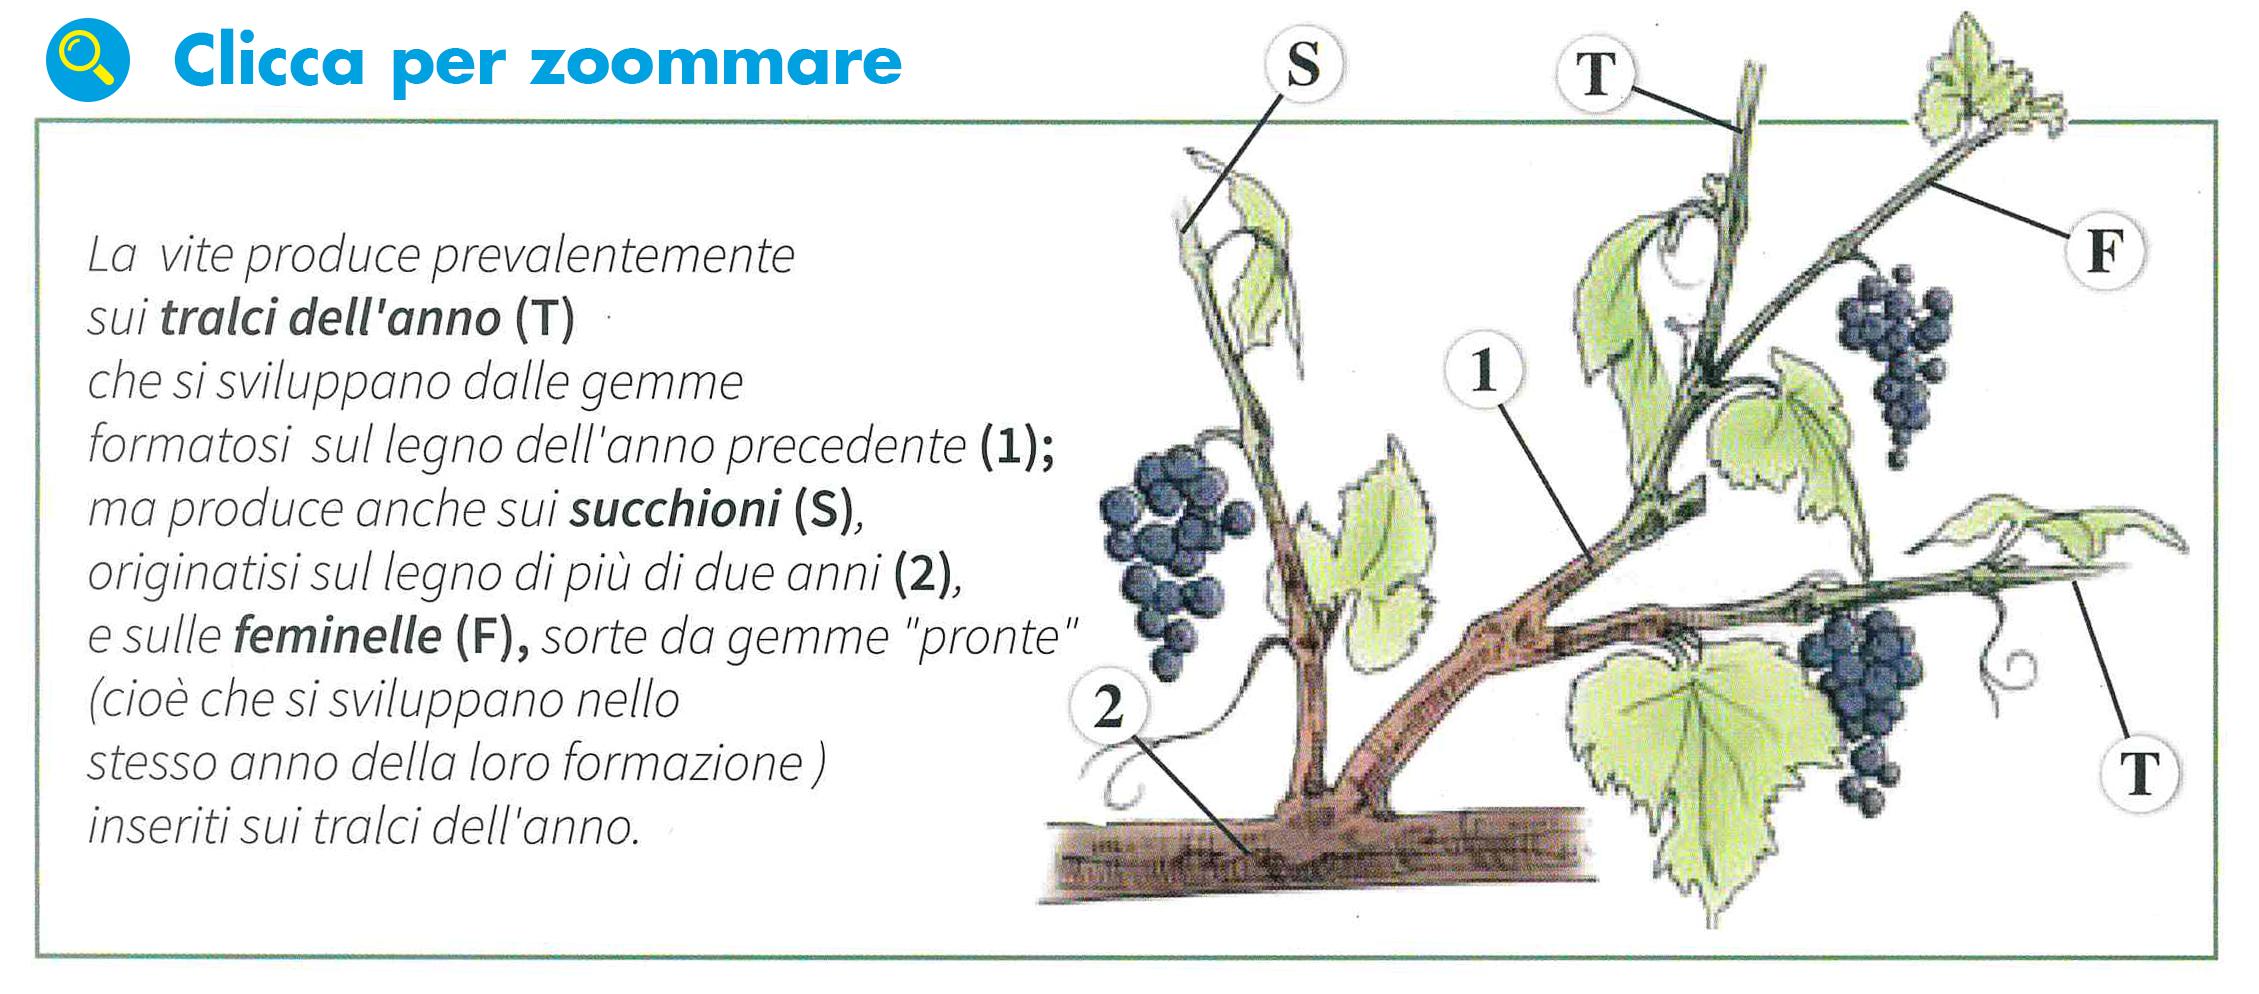 I princ pi operativi nella potatura agrimag - Potatura uva da tavola ...